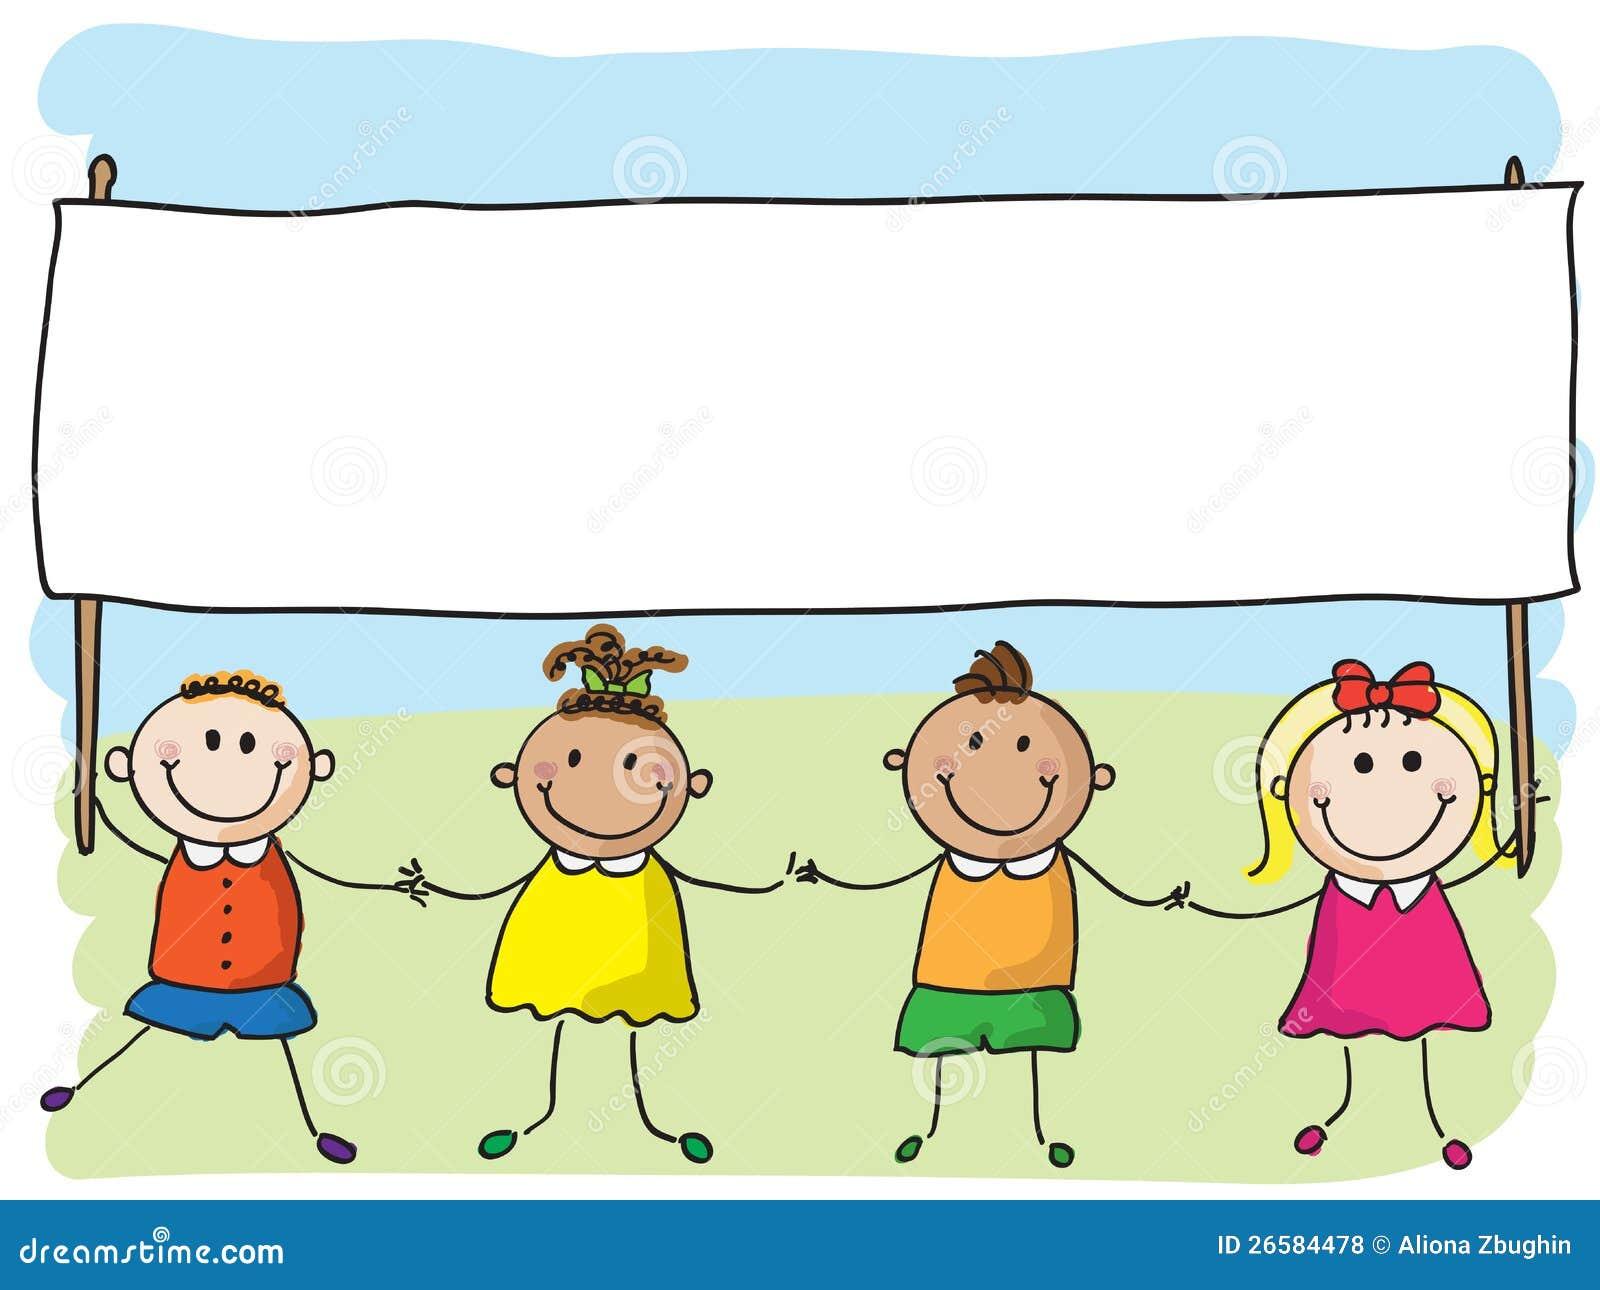 Children With Banner Stock Vector. Illustration Of Boys